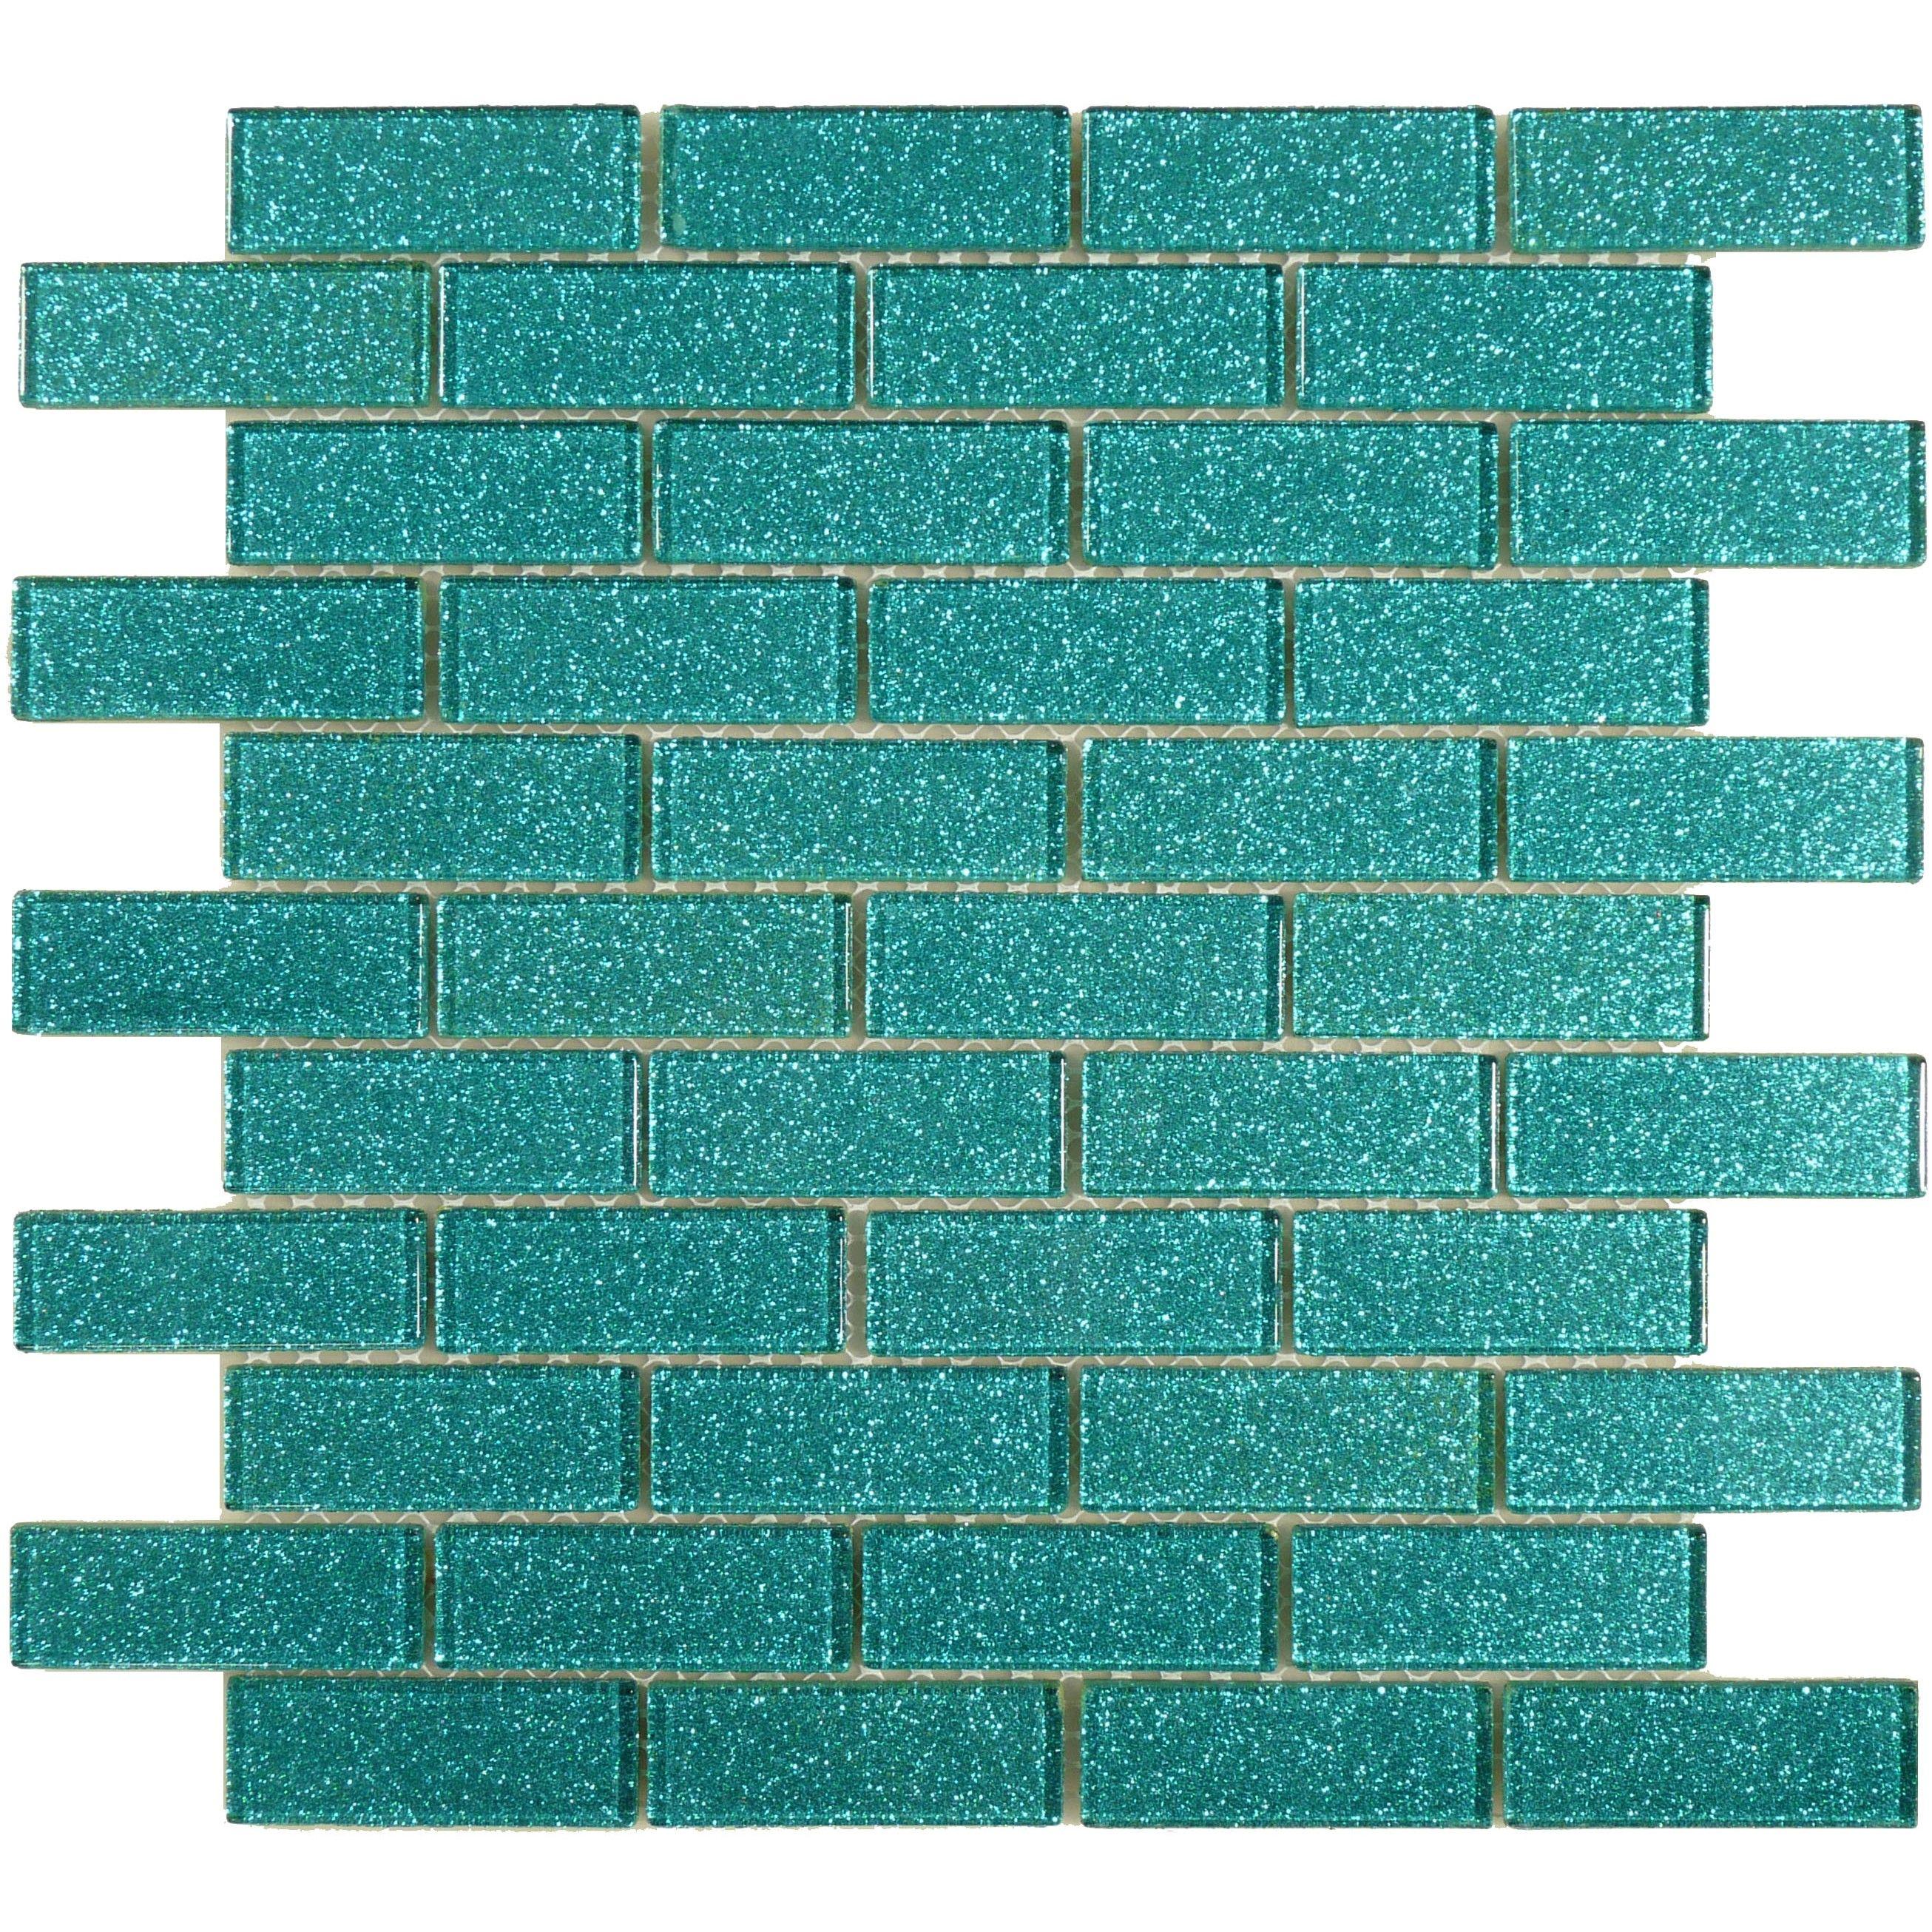 1 X 3 Aqua Glass Uniform Brick Tile Glossy Blgd303a Aqua Glass Aqua Glass Tiles Aqua Tiles